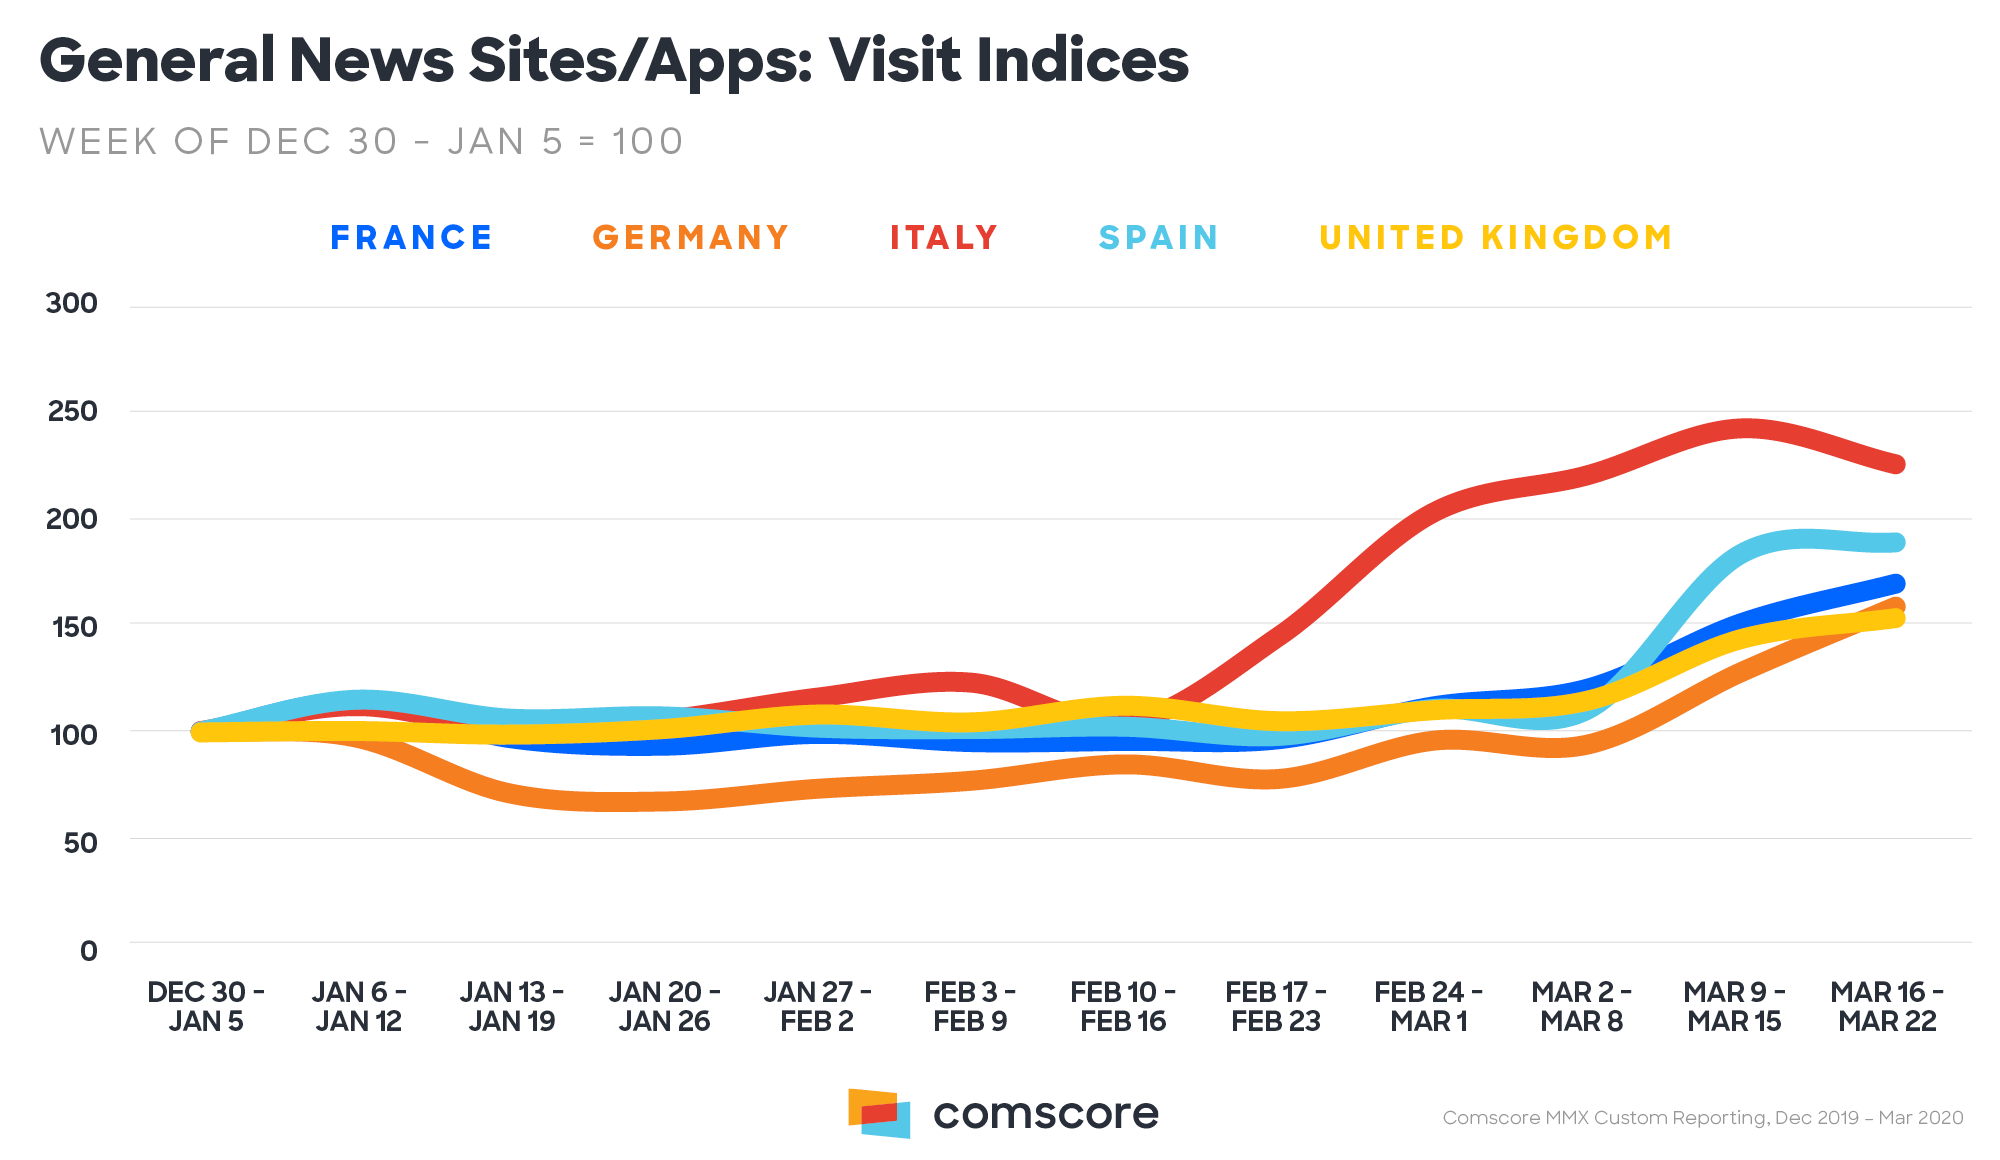 News generaliste - siti e app